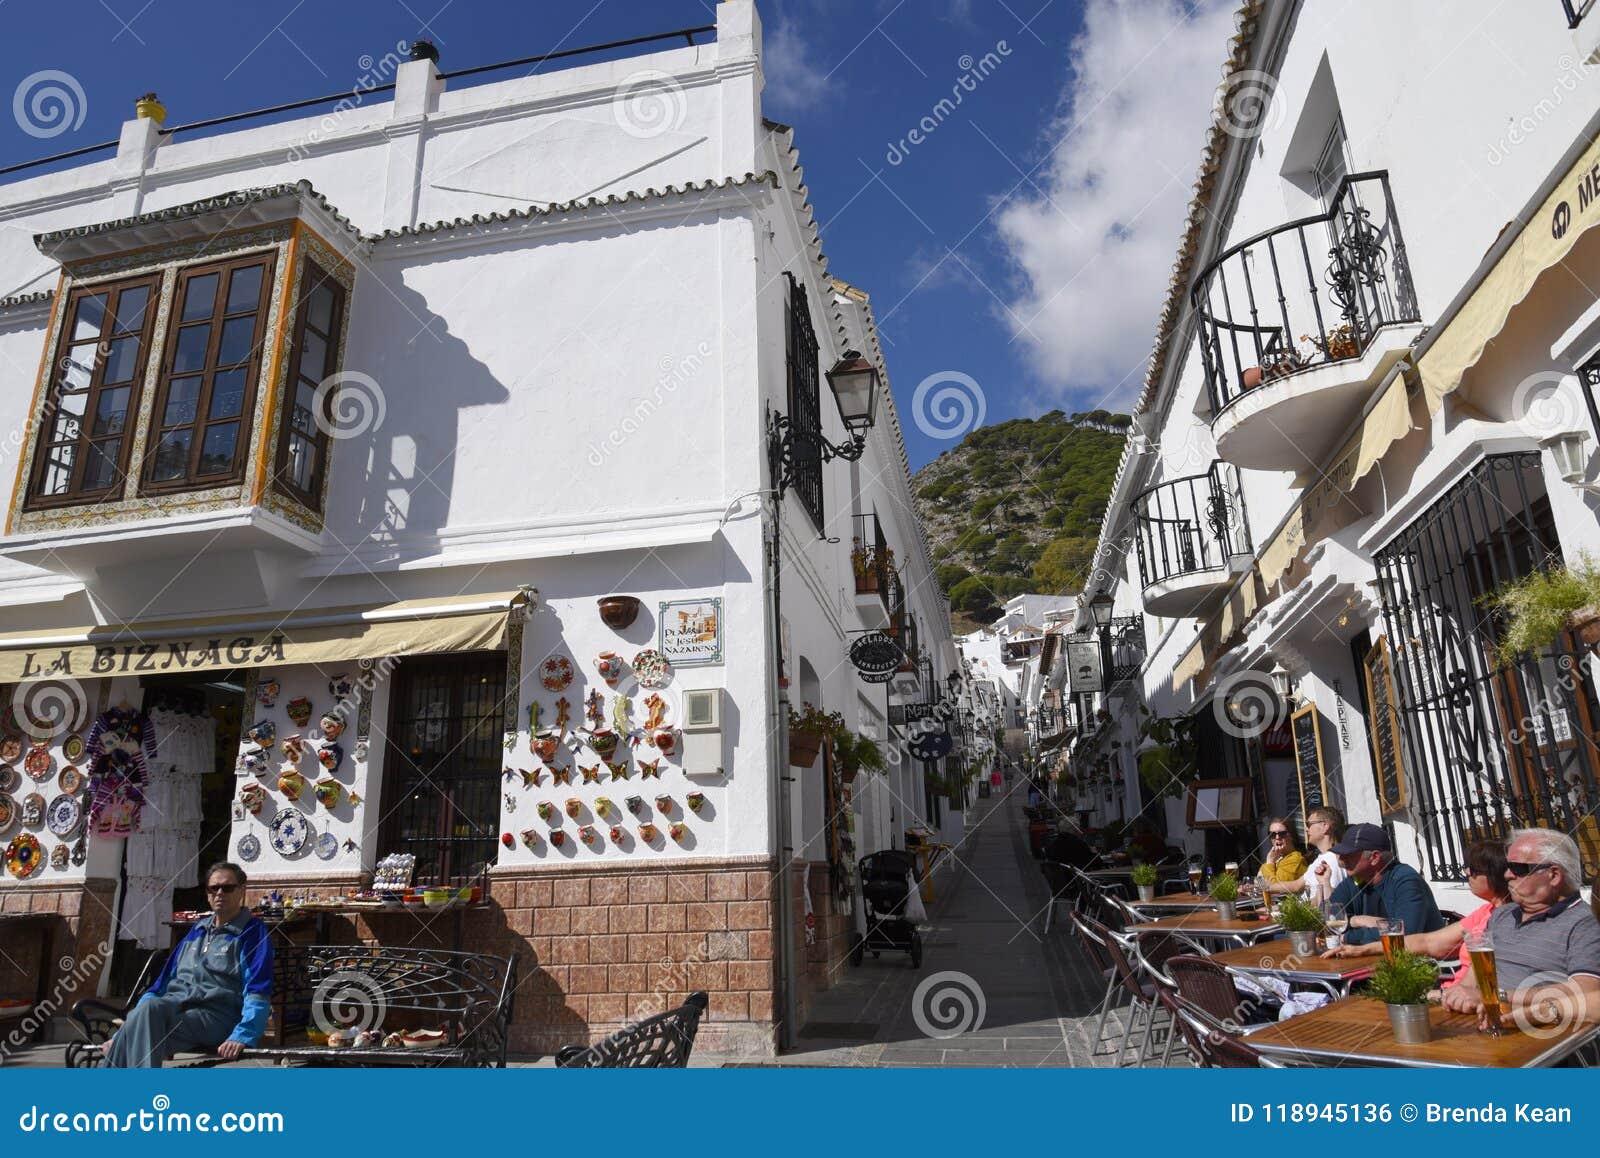 San Sebastian Street In Mijas dans les montagnes au-dessus de Costa del Sol en Espagne